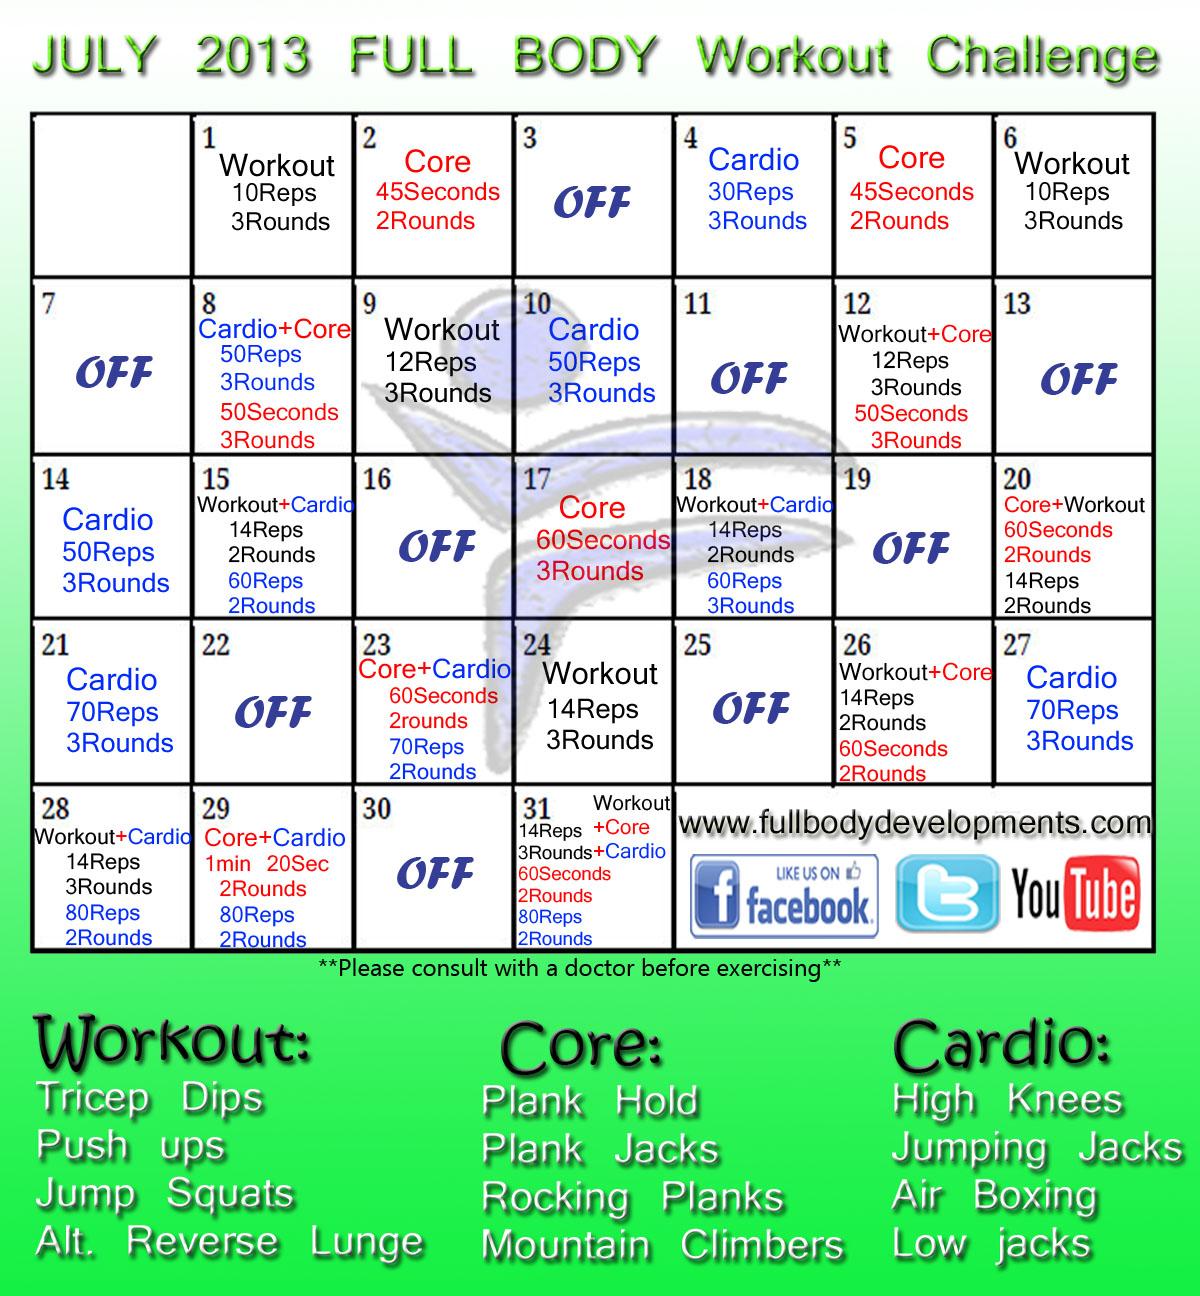 Fbd July Challenge Full Body Workout Challenge Full Body Developments Personal Training